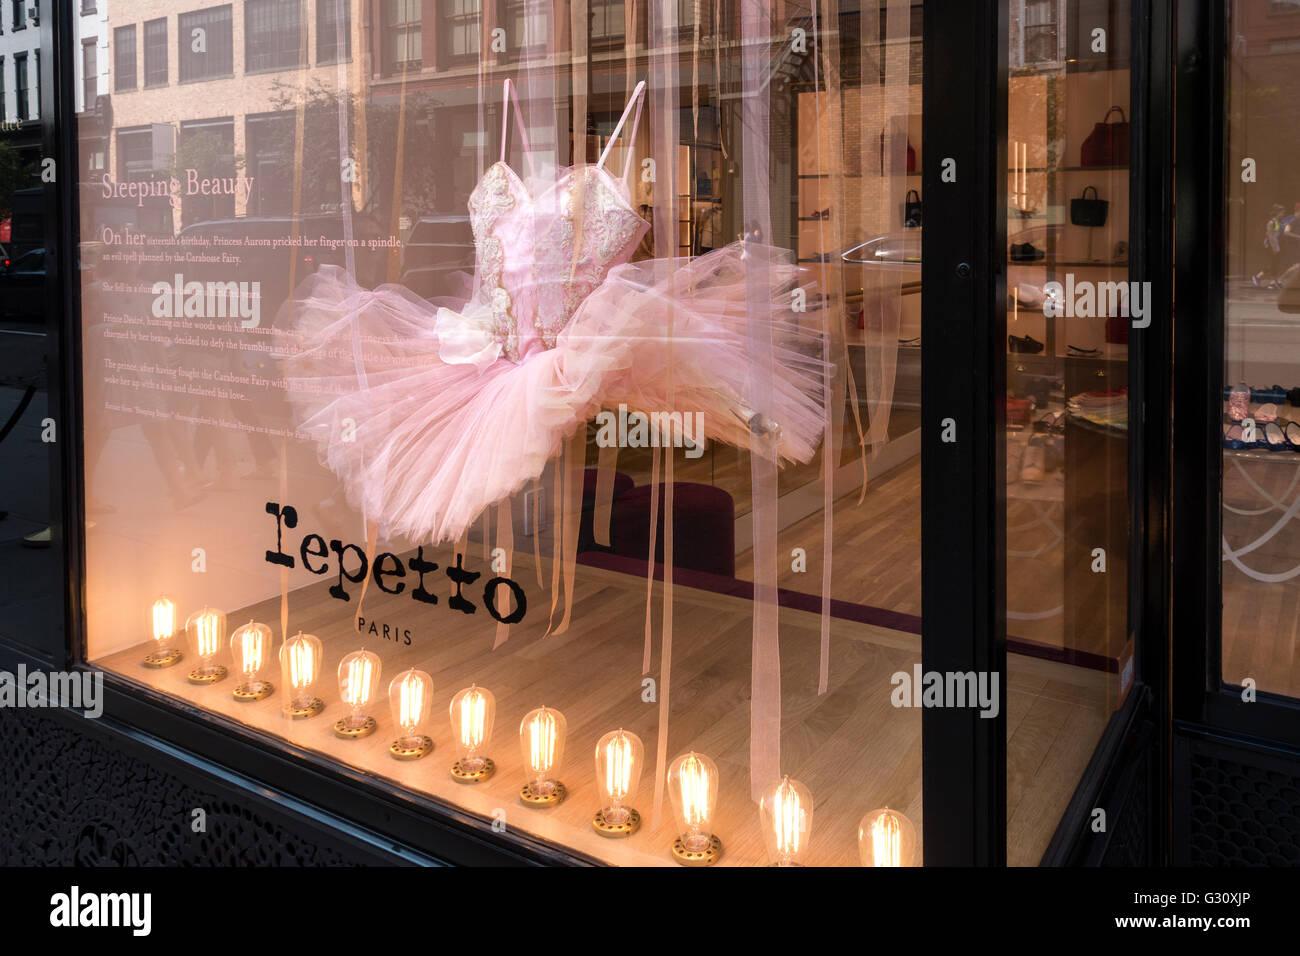 repetto-paris-shop-in-soho-in-new-york-c